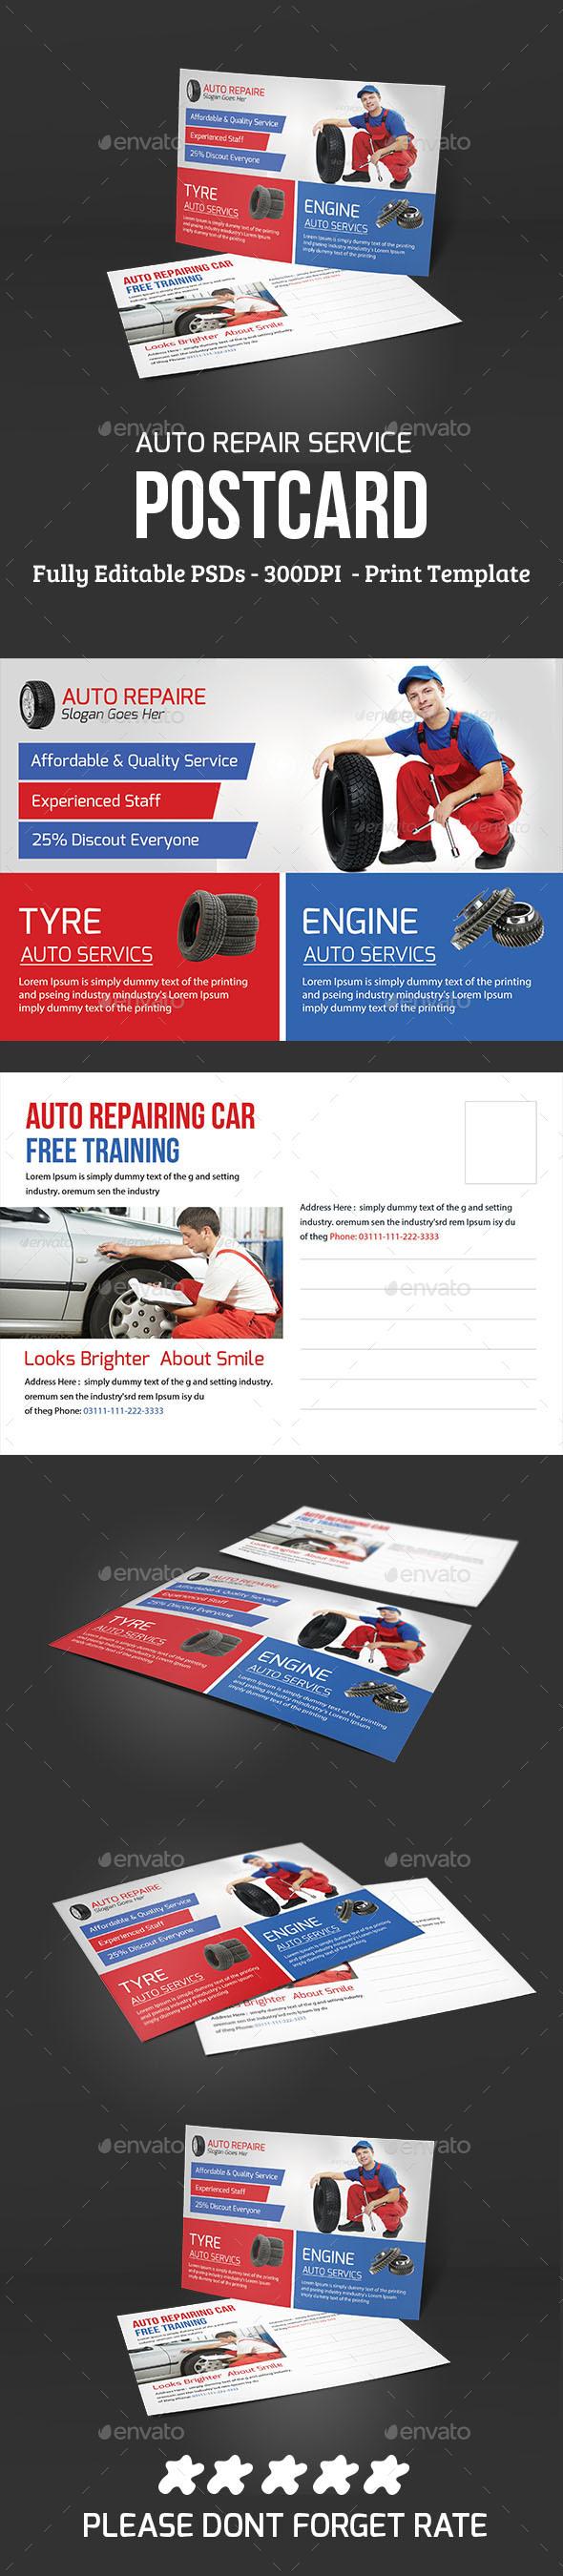 Auto Repair Service Post Card - Cards & Invites Print Templates